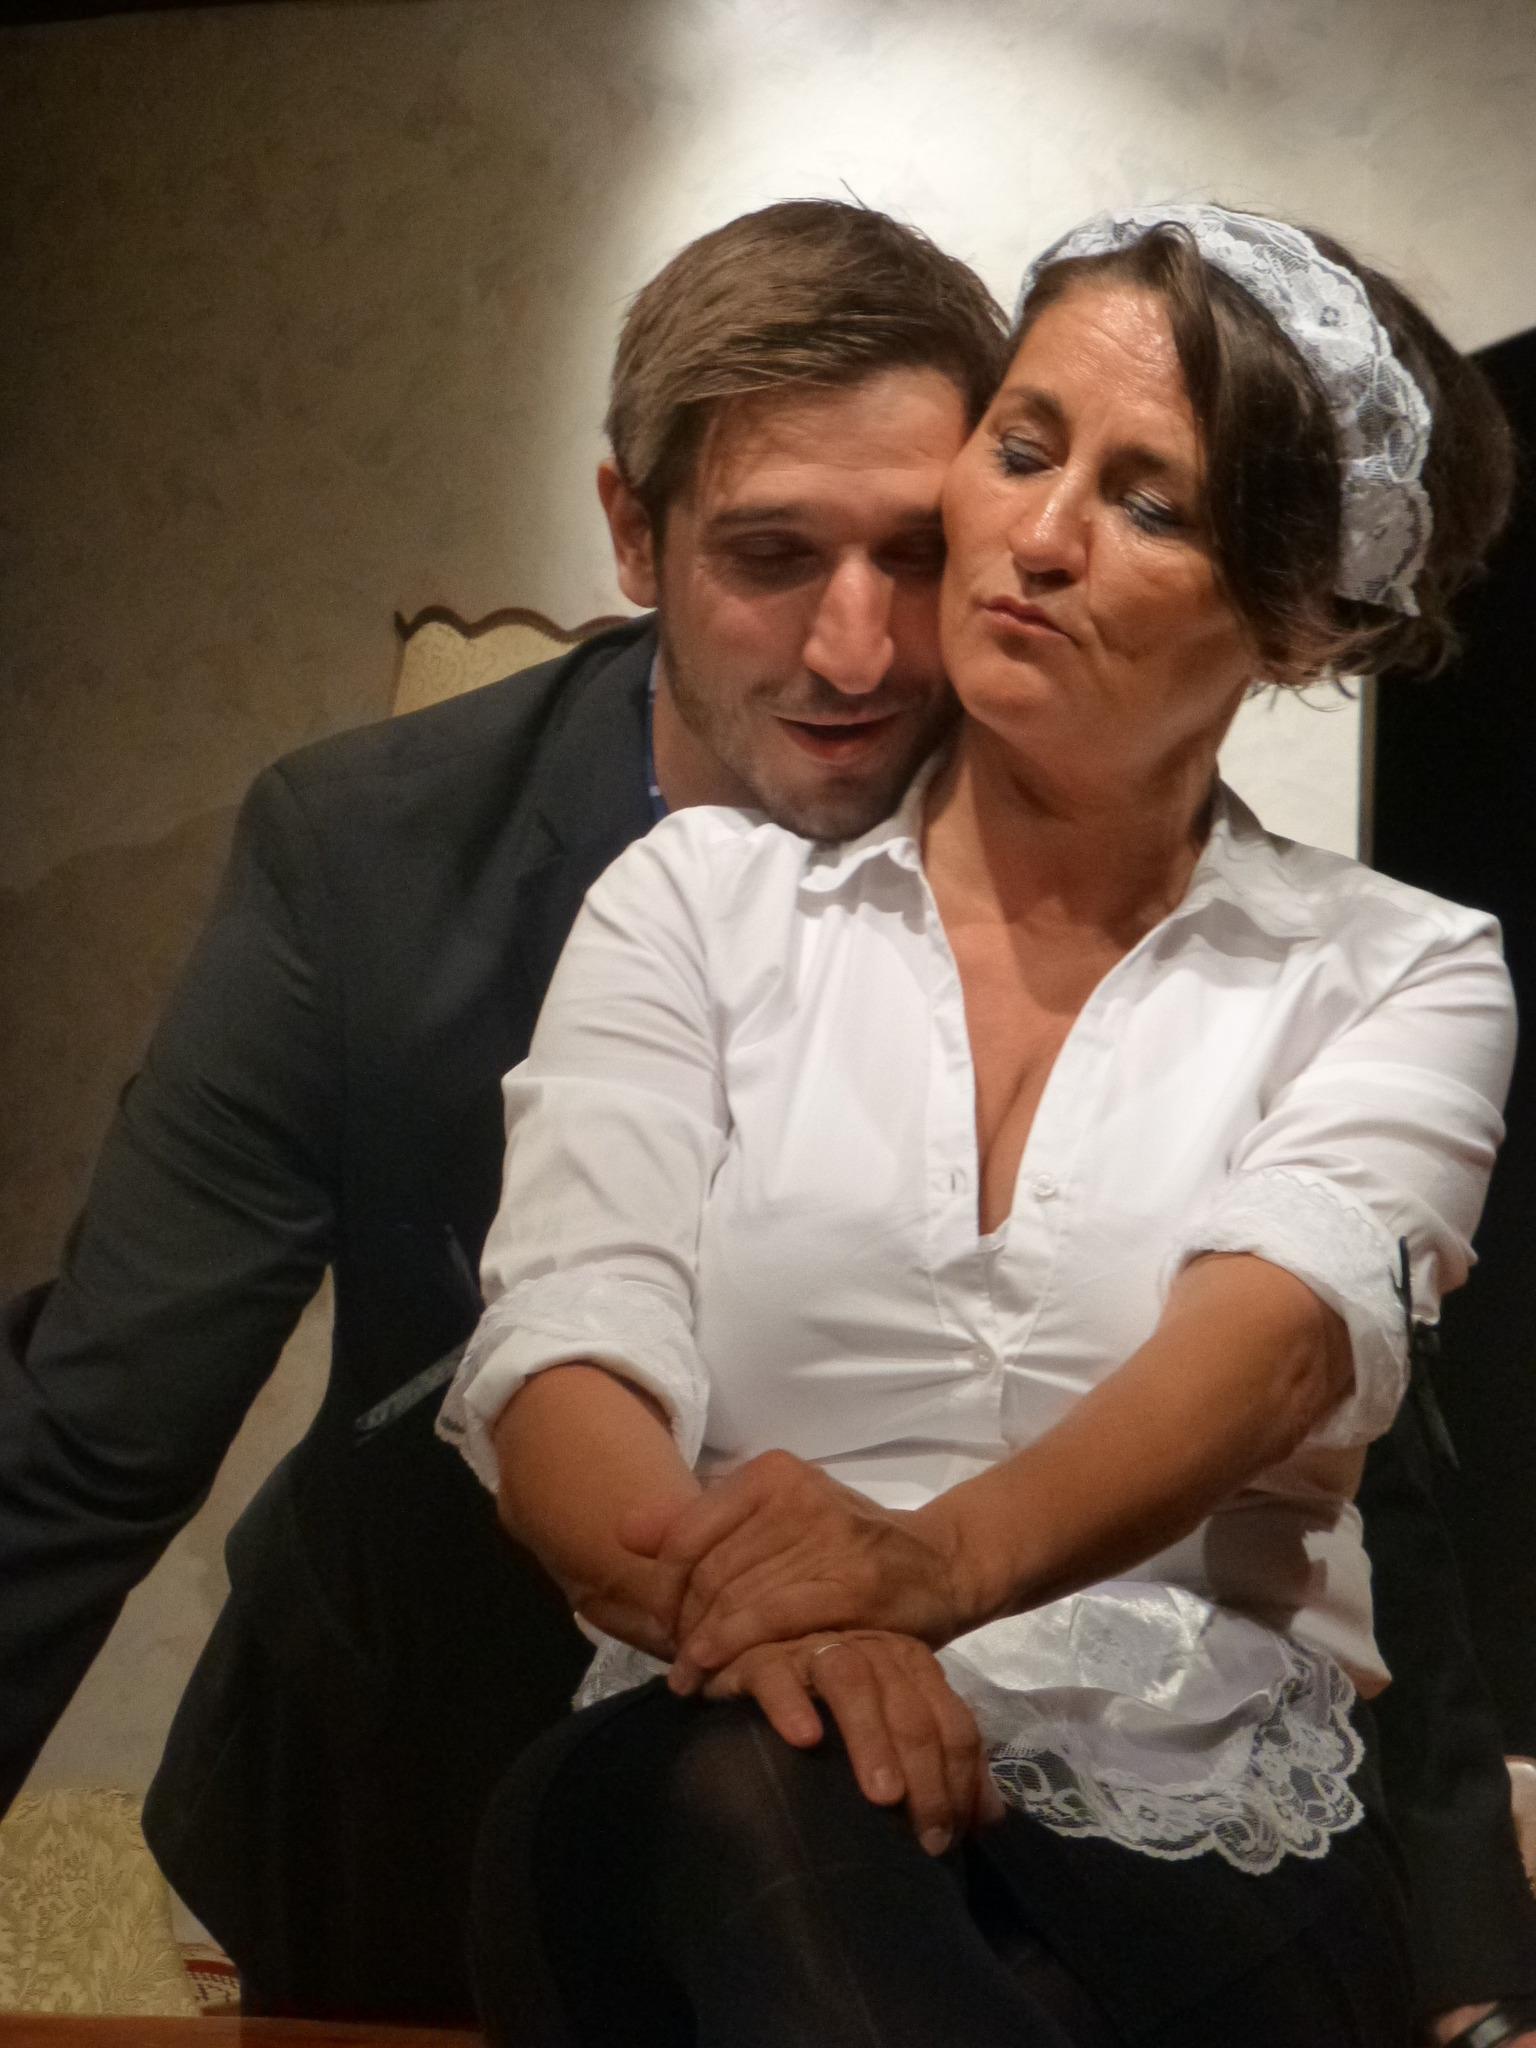 Eng sexkontakte: Single kino aus markersdorf-haindorf